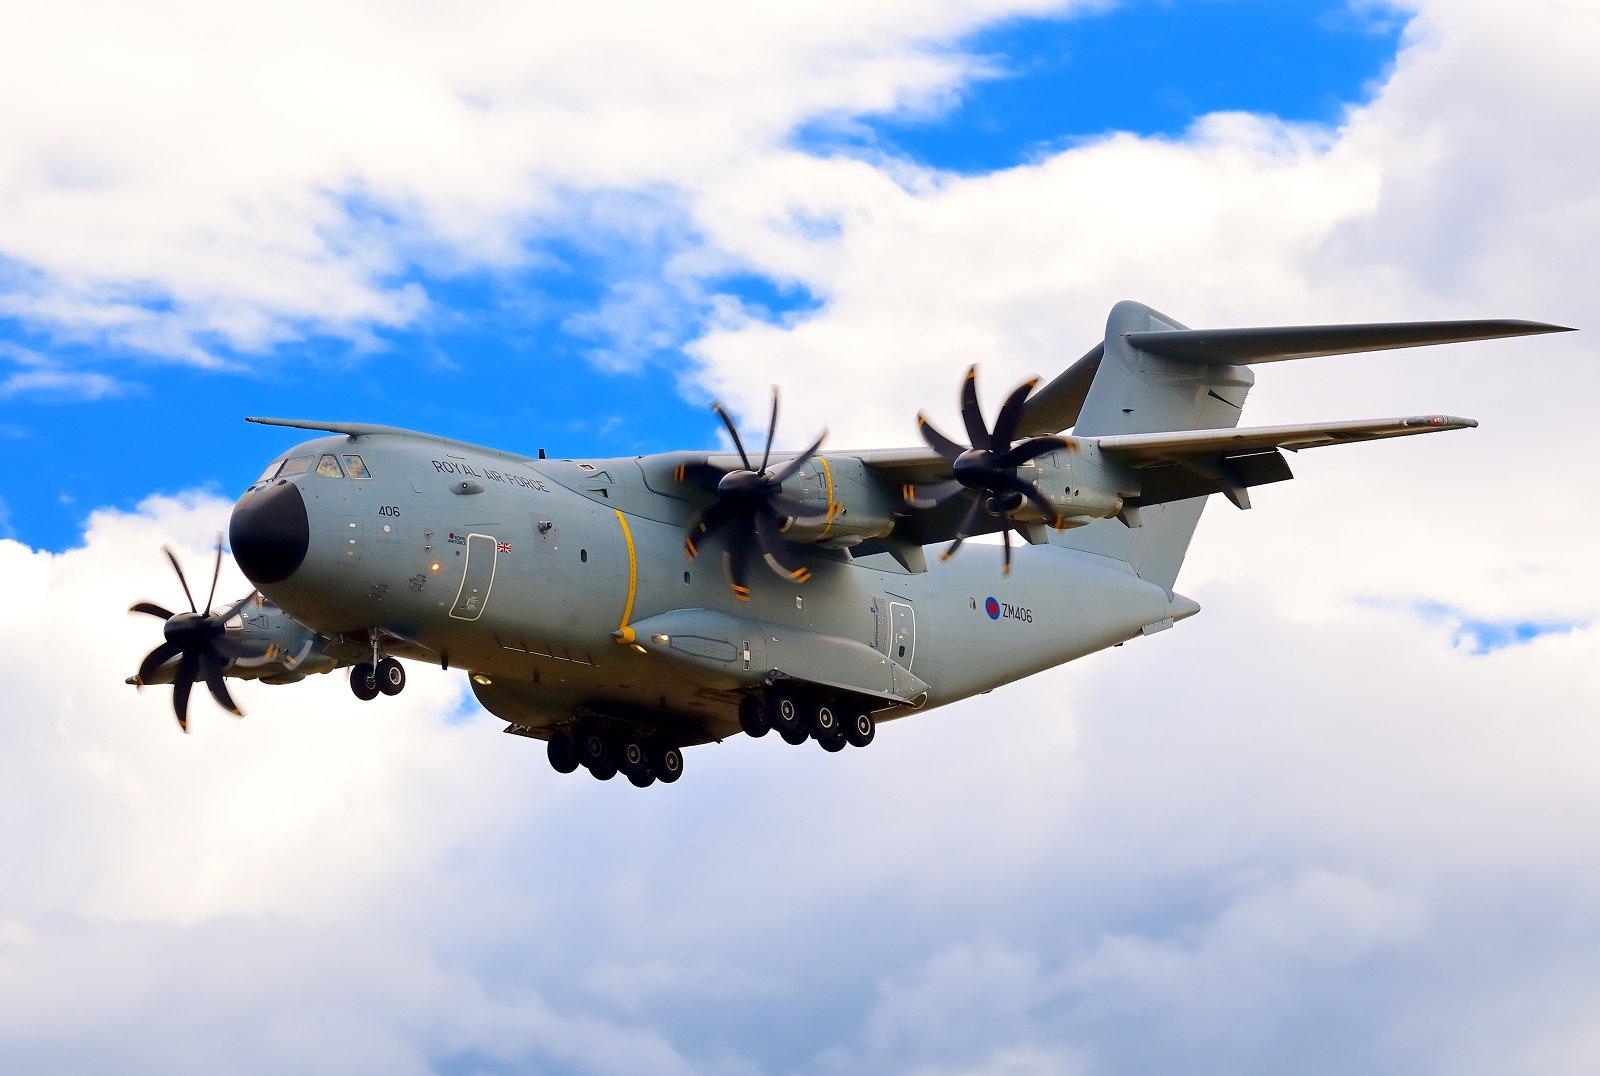 ZM406 - Airbus A400M Atlas C.1 - Royal Air Force (RAF) (Isobritannian ilmavoimat) - 31.8.2020